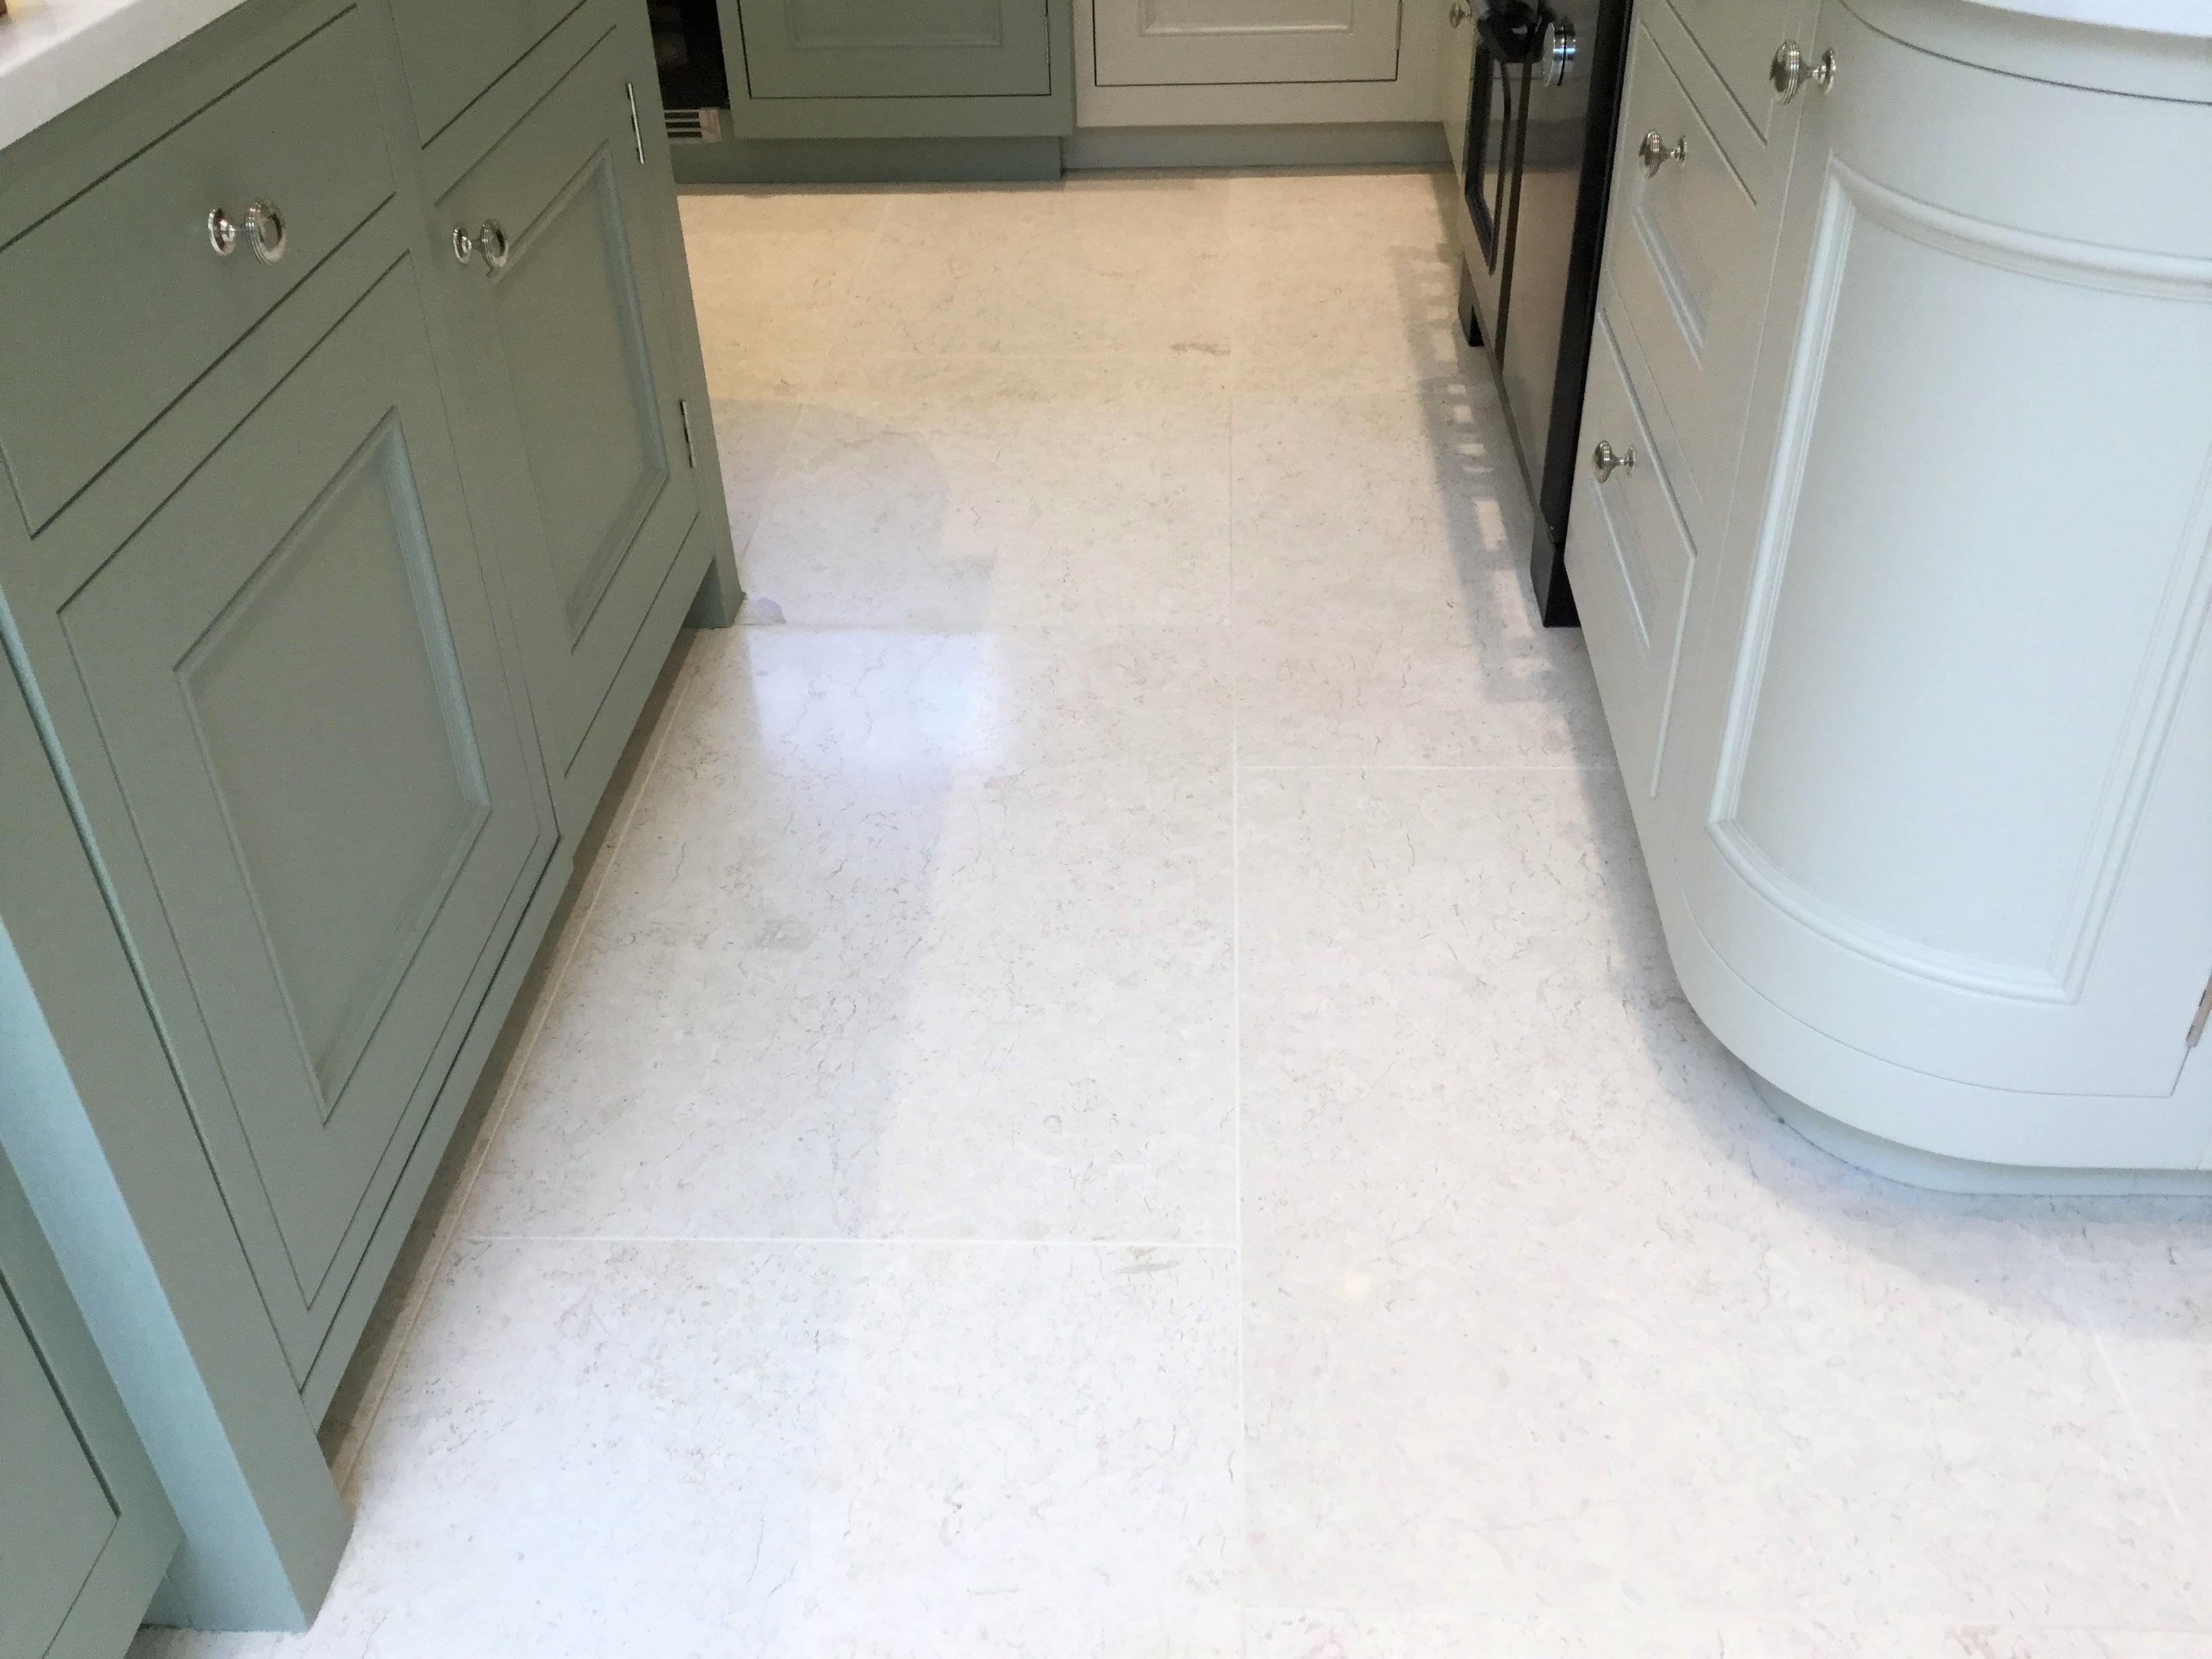 Limestone Tiled Kitchen Floor After Renovation Ecton